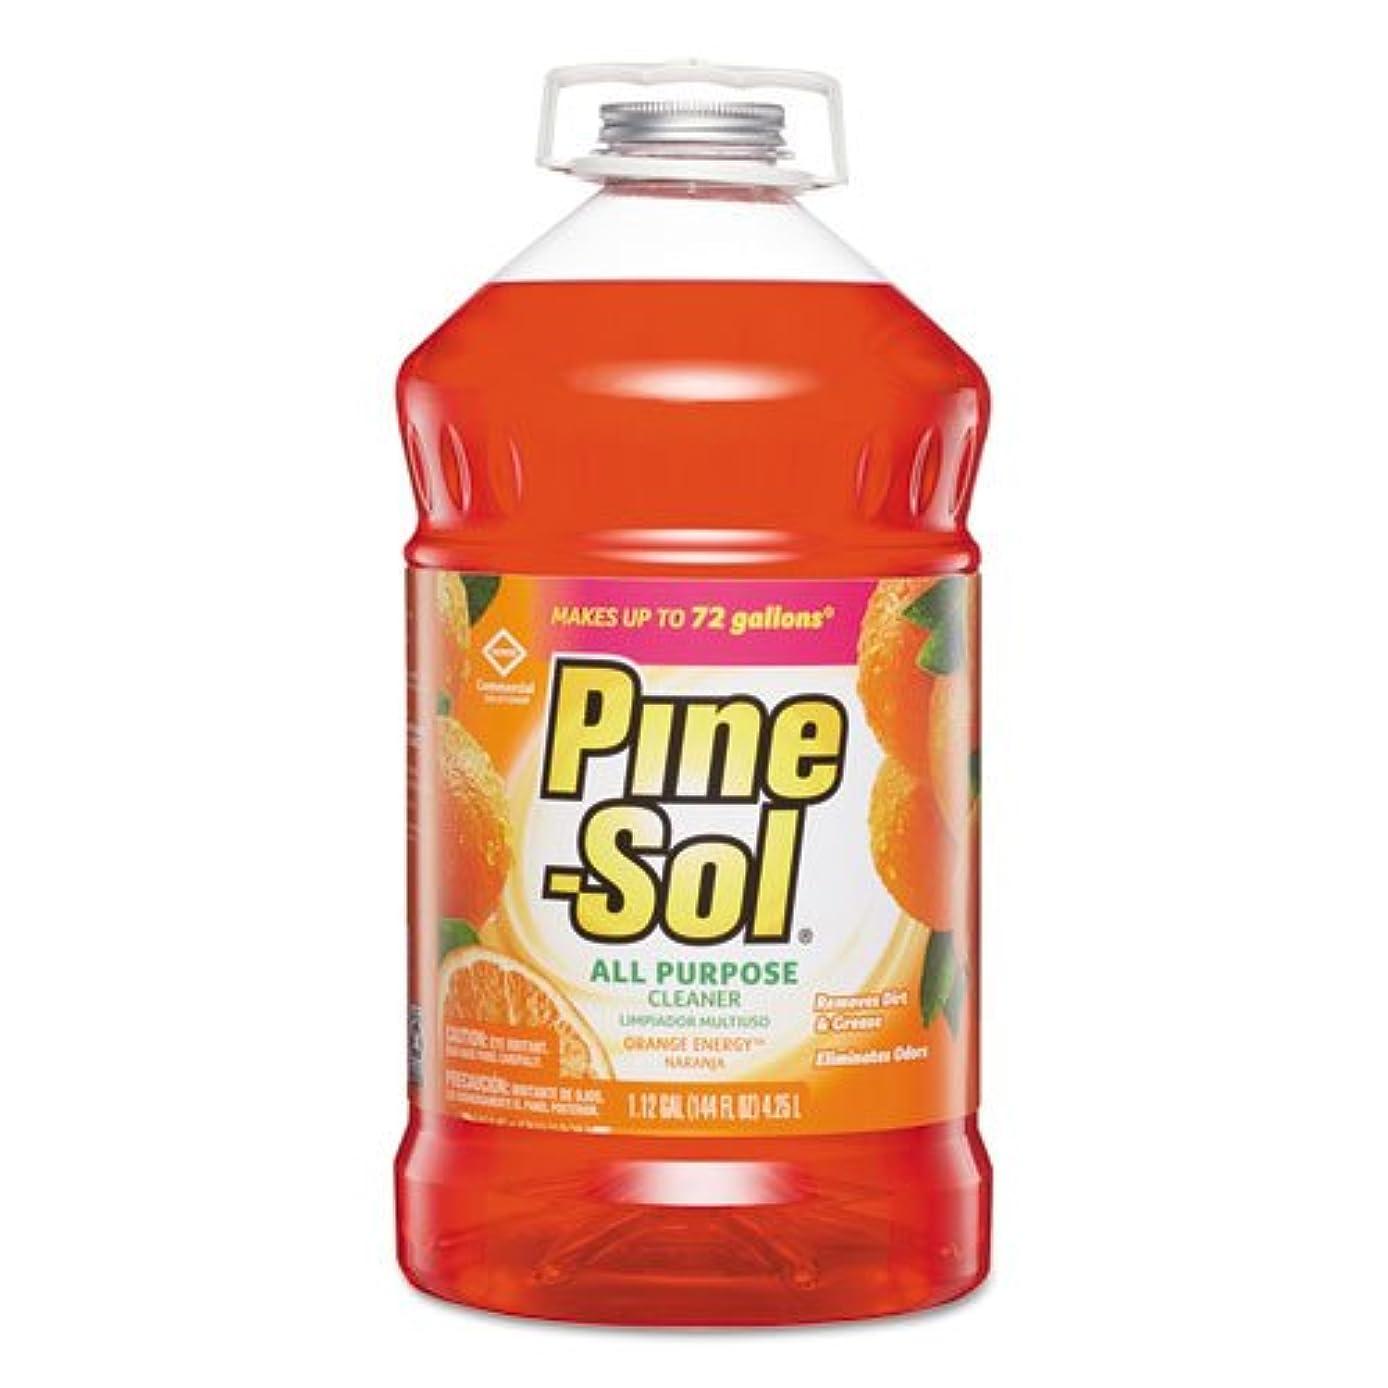 COX41772EA - Clorox Pine-Sol All-Purpose Cleaner